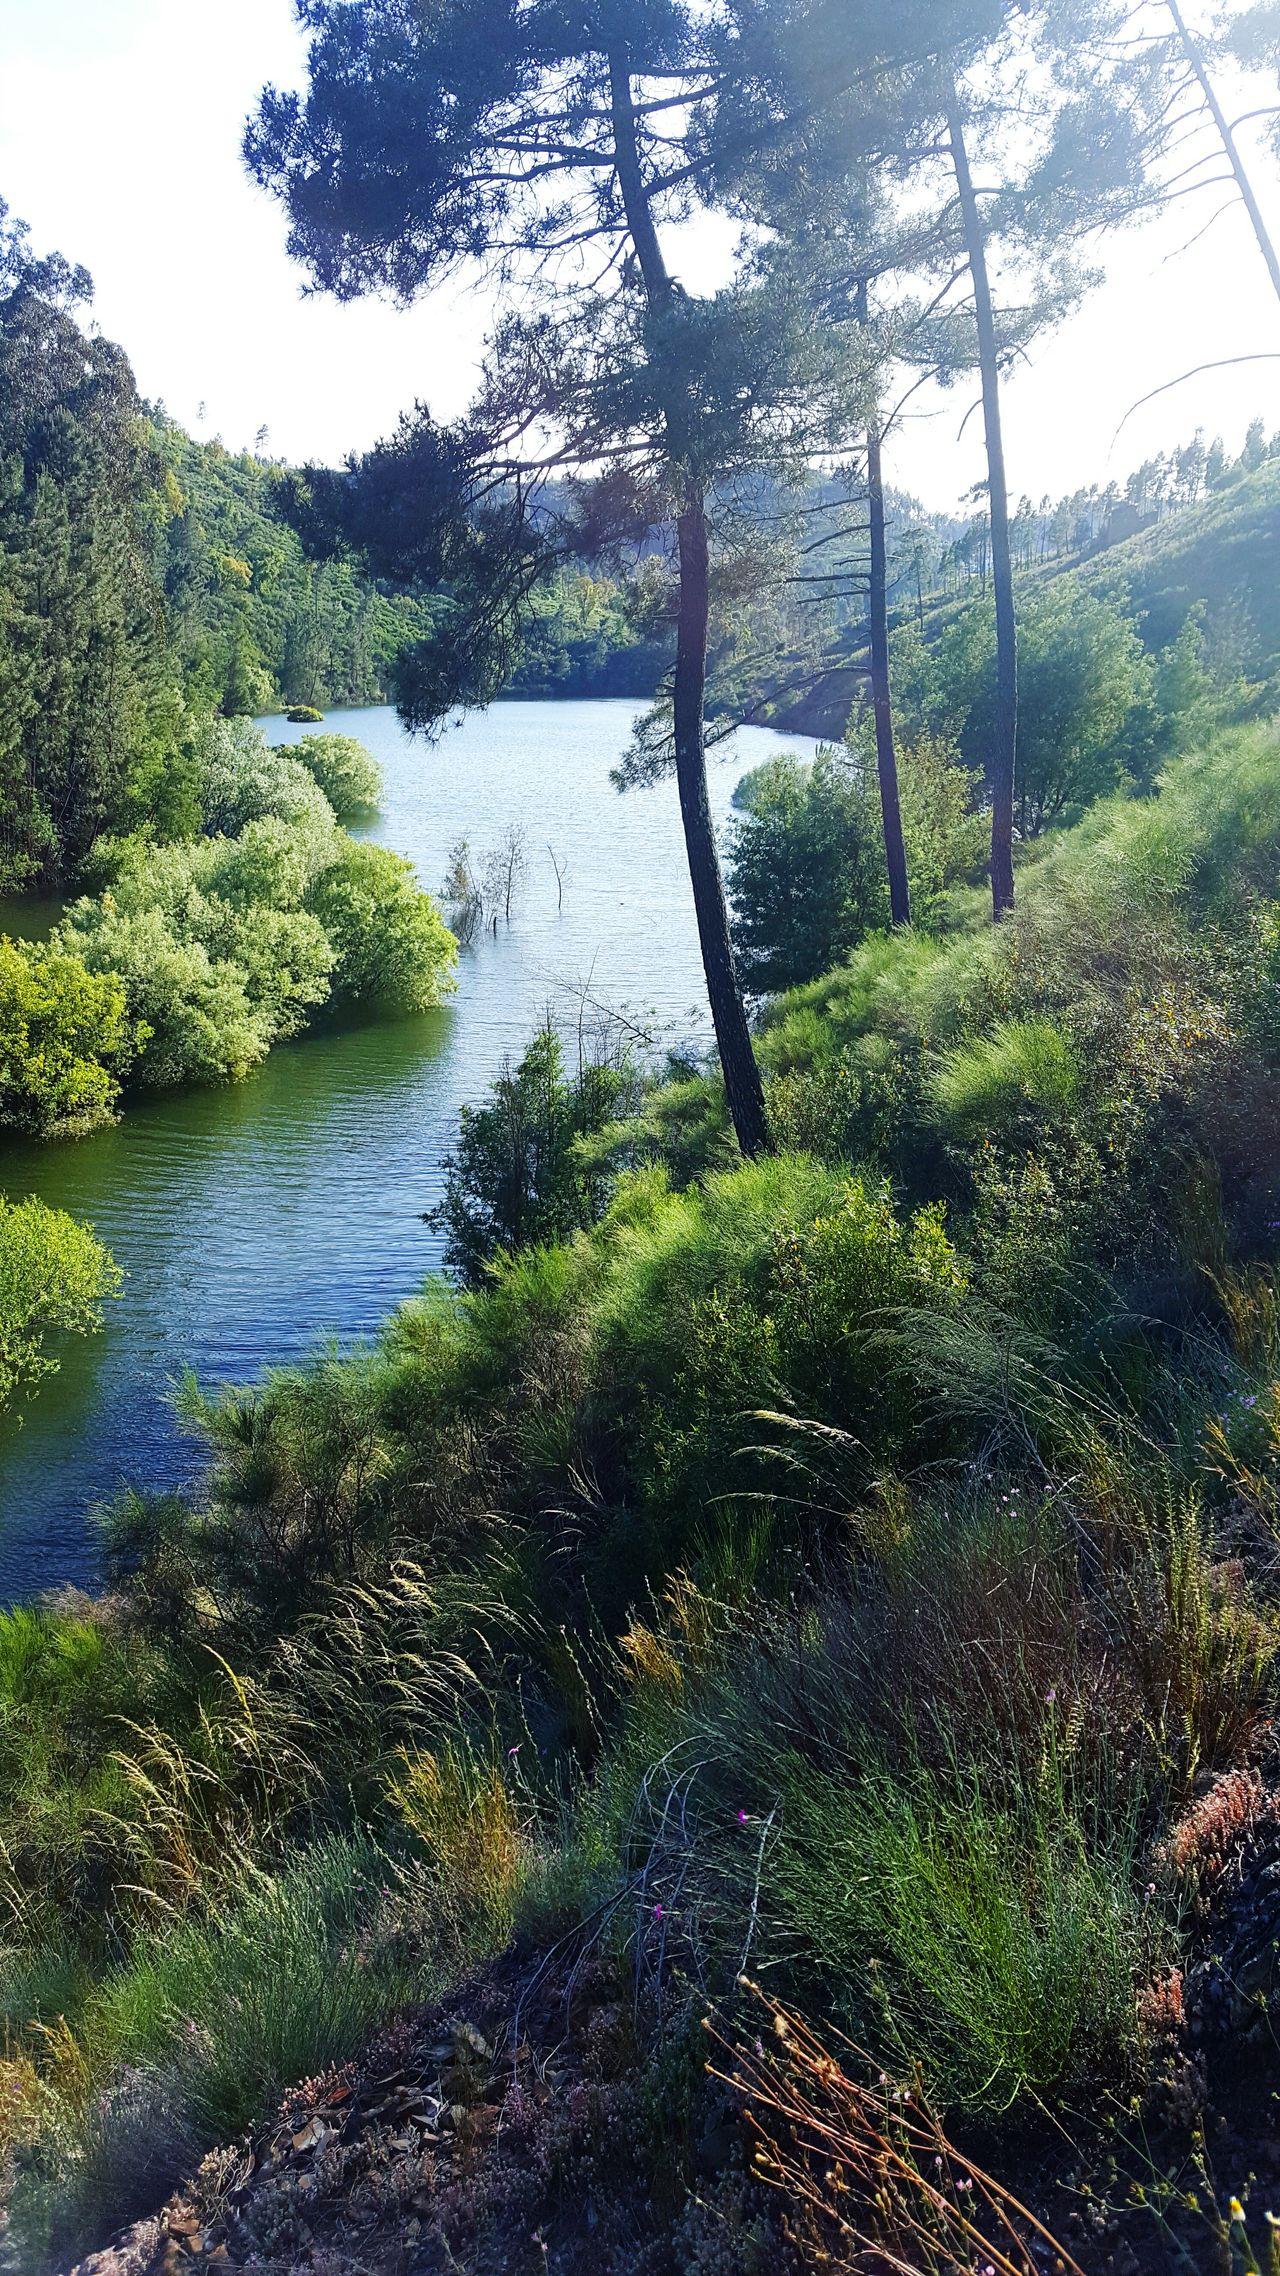 Paisagem Natureza🍁 Natureza 🐦🌳 Monte Valley River Barragemcastelodobode Water Barragensdeportugal Rio